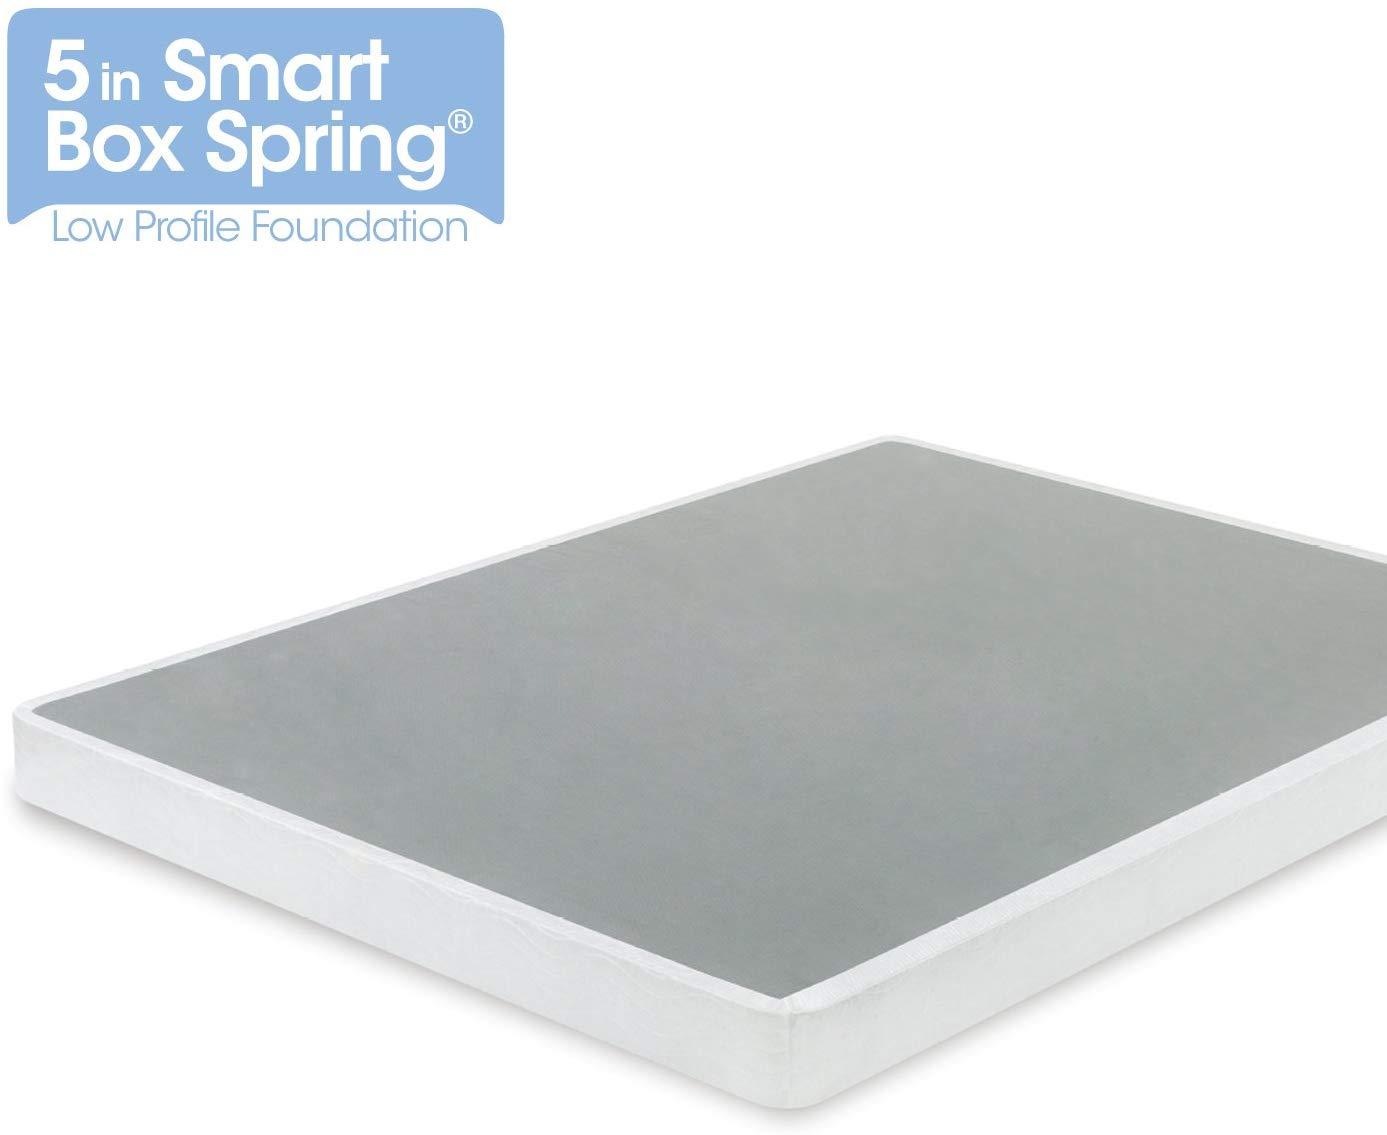 Zinus Armita 5 Inch Low Profile Smart Box Spring